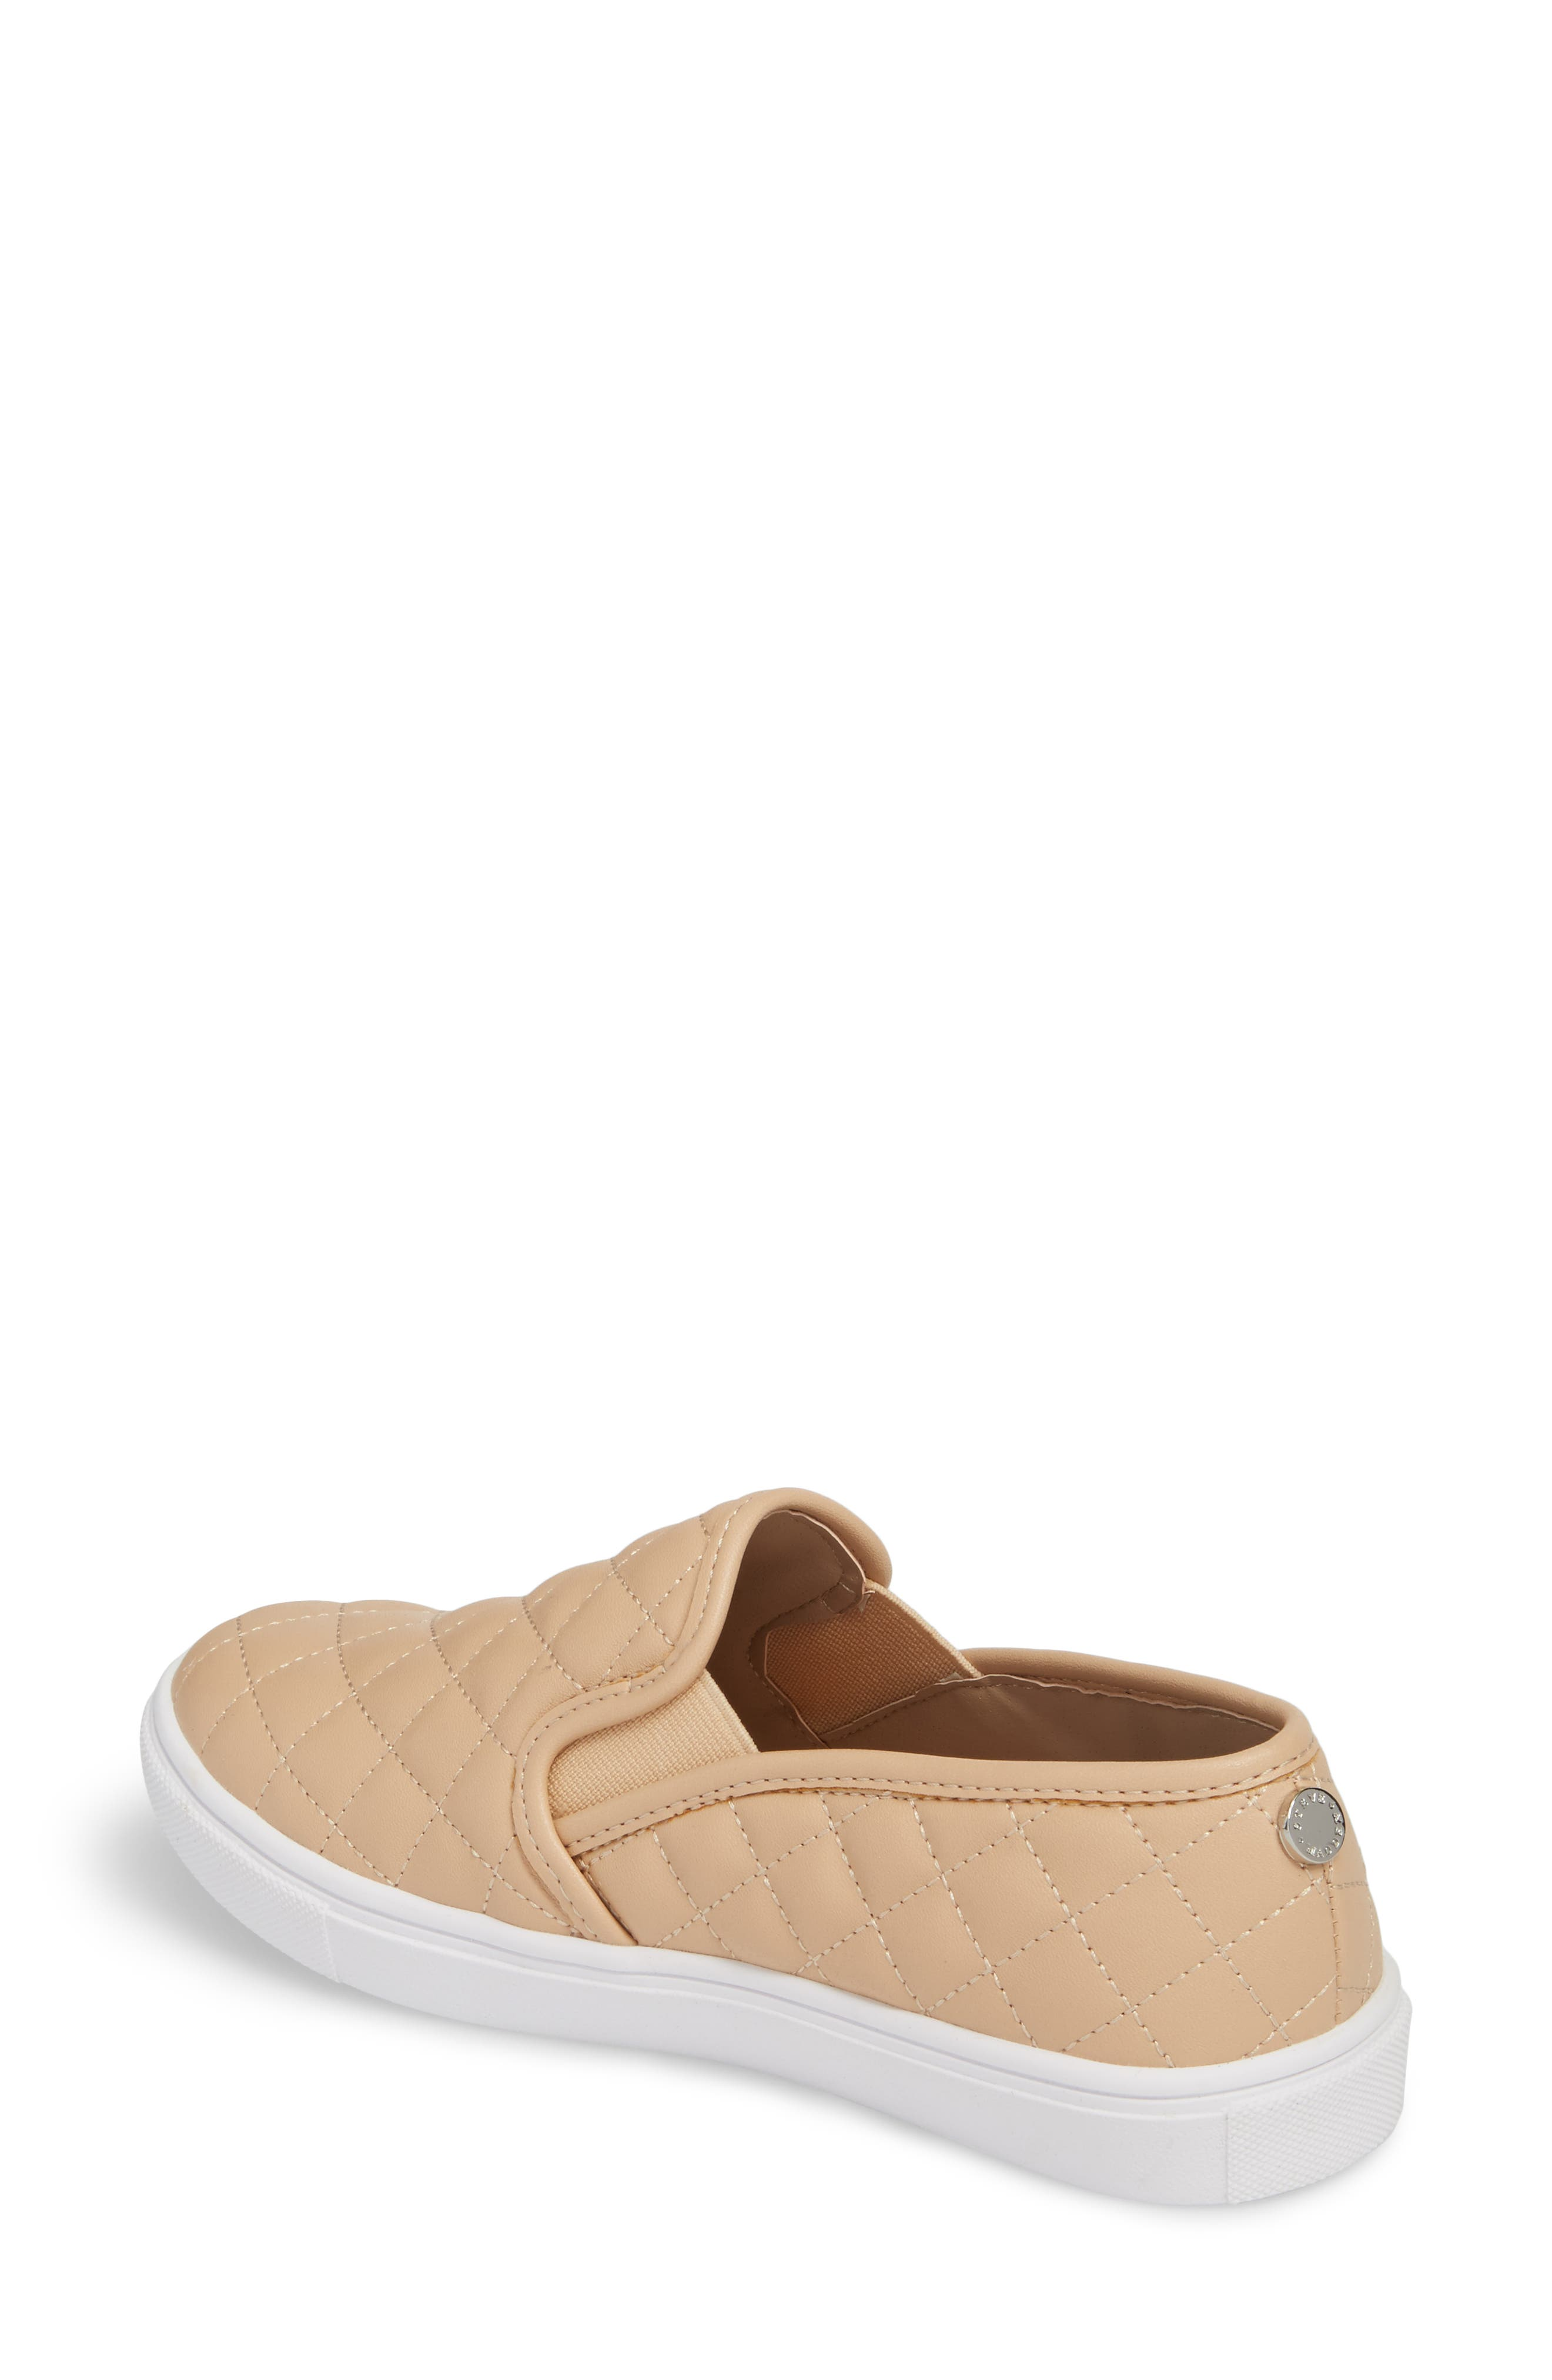 Ecentrcq Sneaker,                             Alternate thumbnail 2, color,                             250